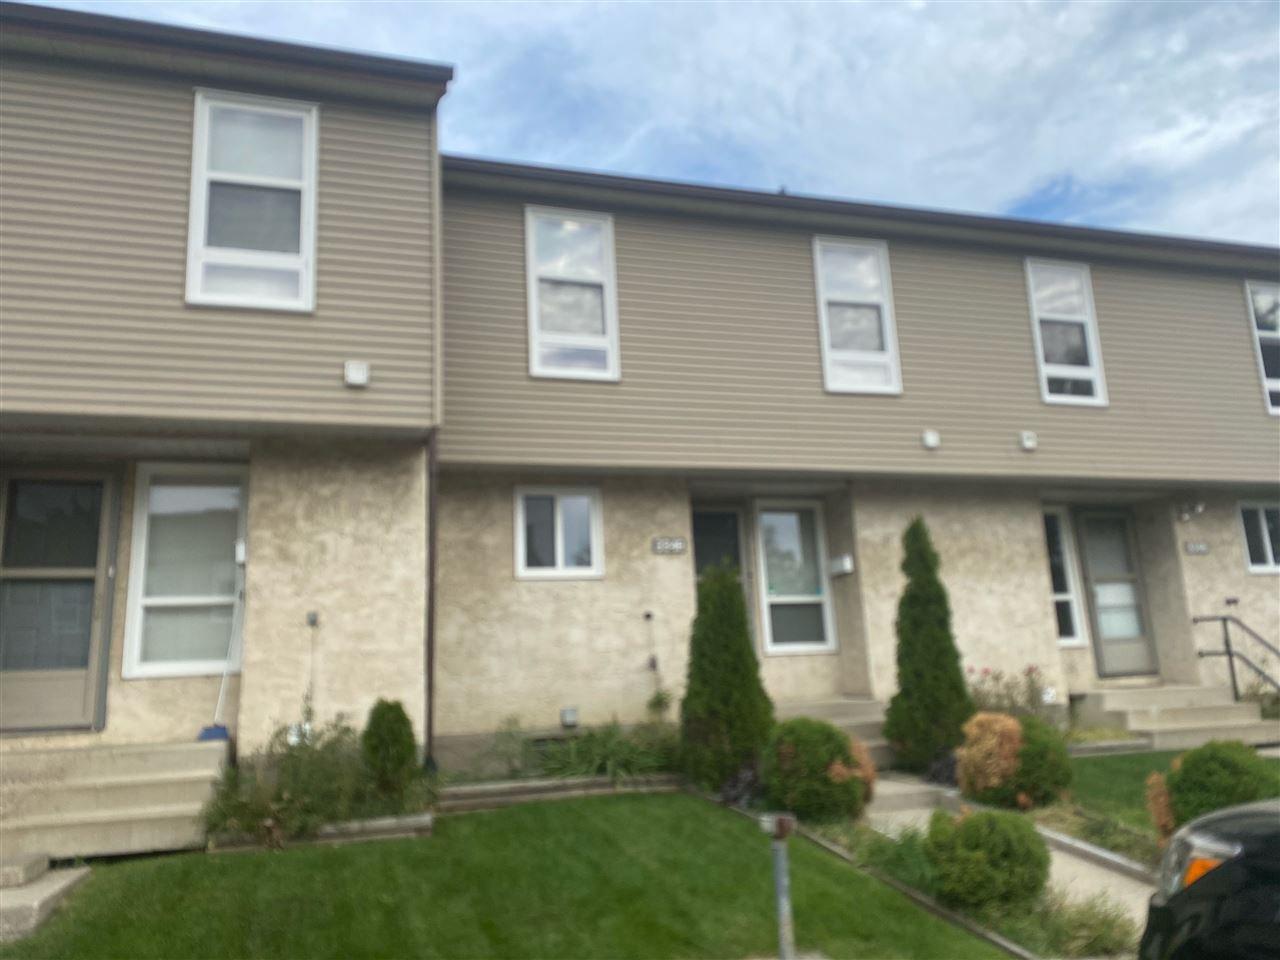 Main Photo: 3348 116A Avenue in Edmonton: Zone 23 Townhouse for sale : MLS®# E4210688